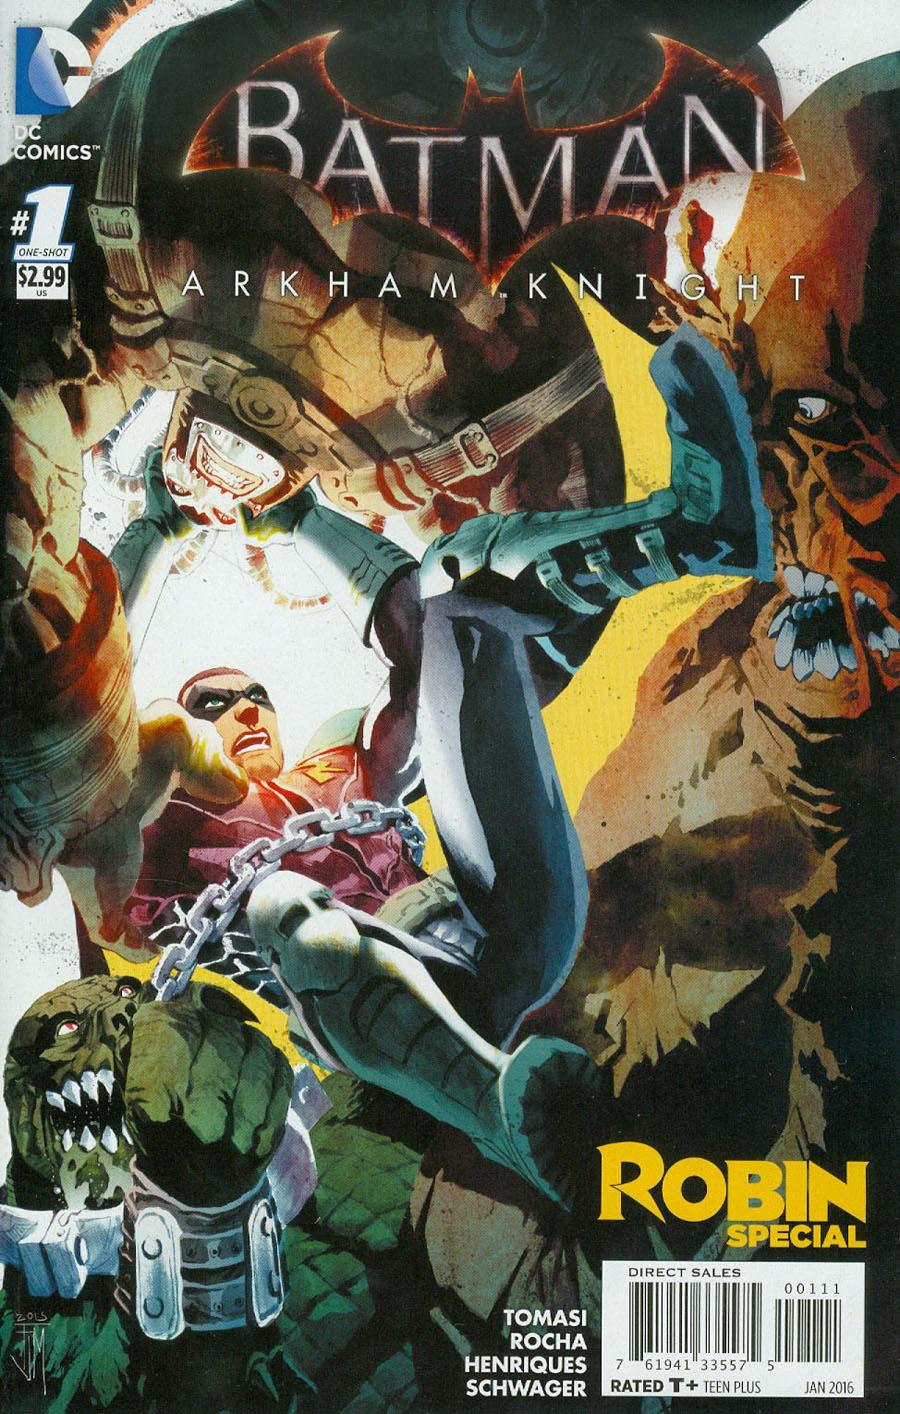 Batman Arkham Knight Robin Special #1